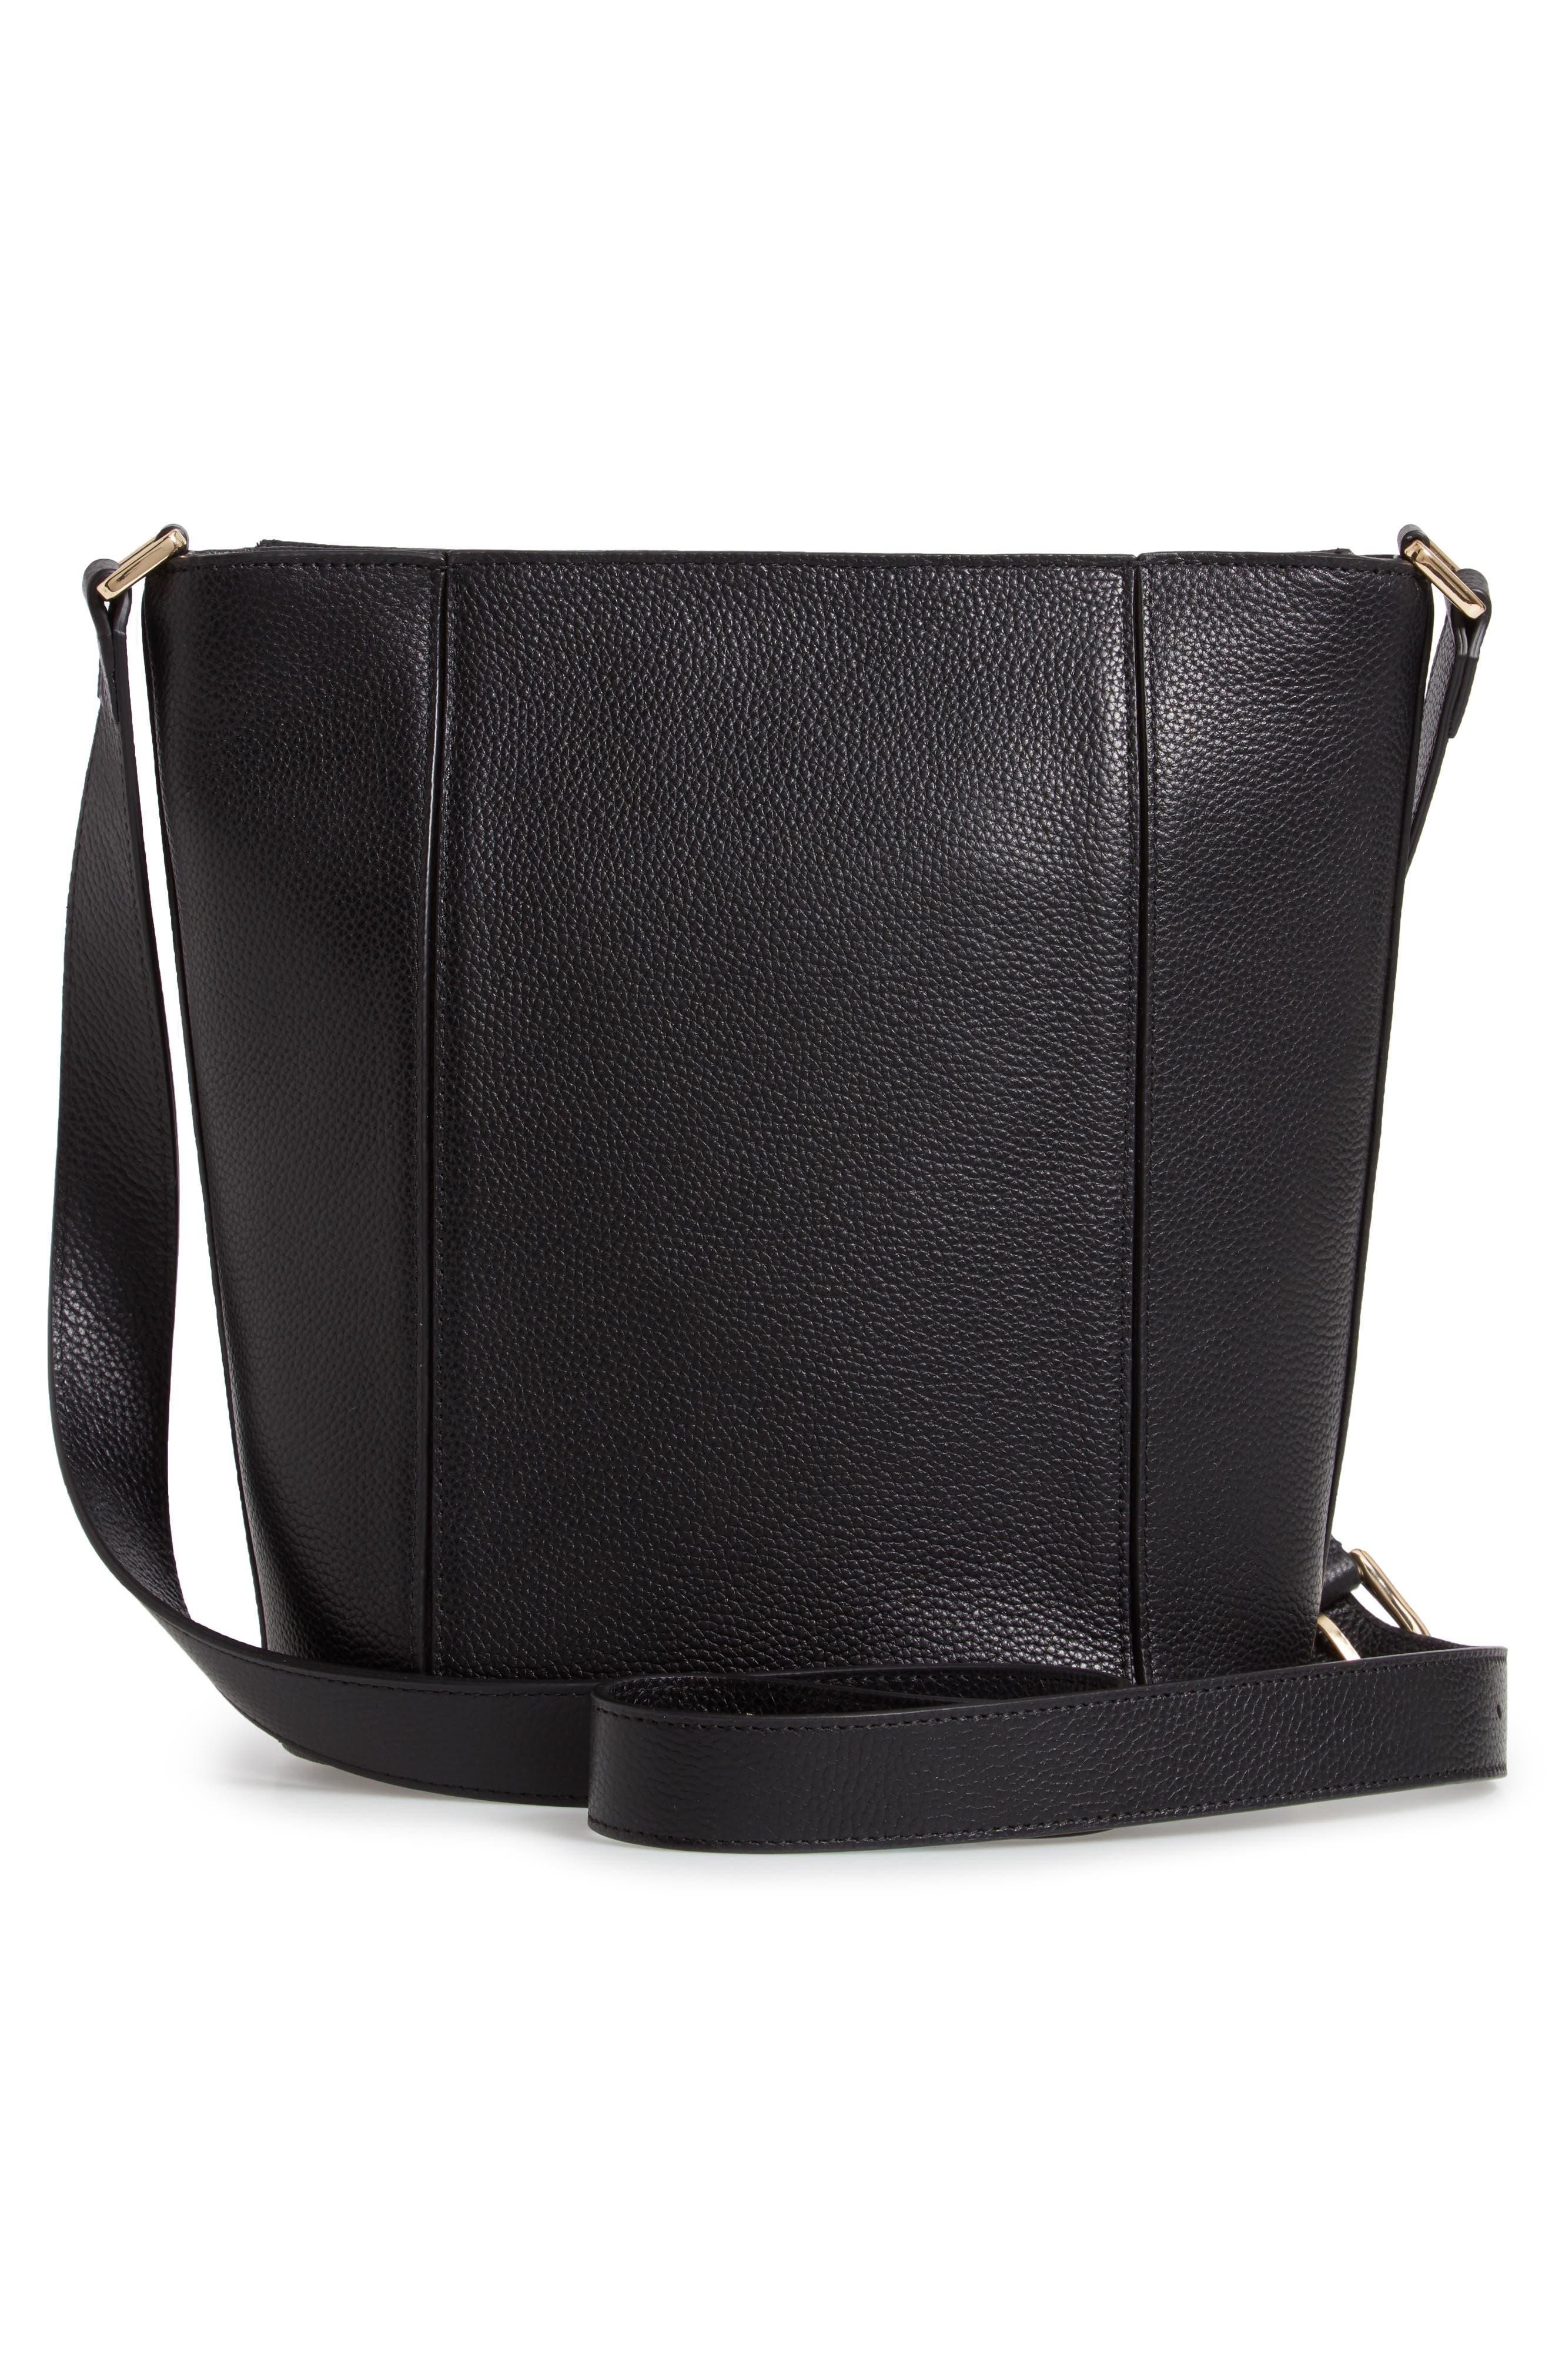 Loraine Leather Bucket Bag,                             Alternate thumbnail 3, color,                             BLACK